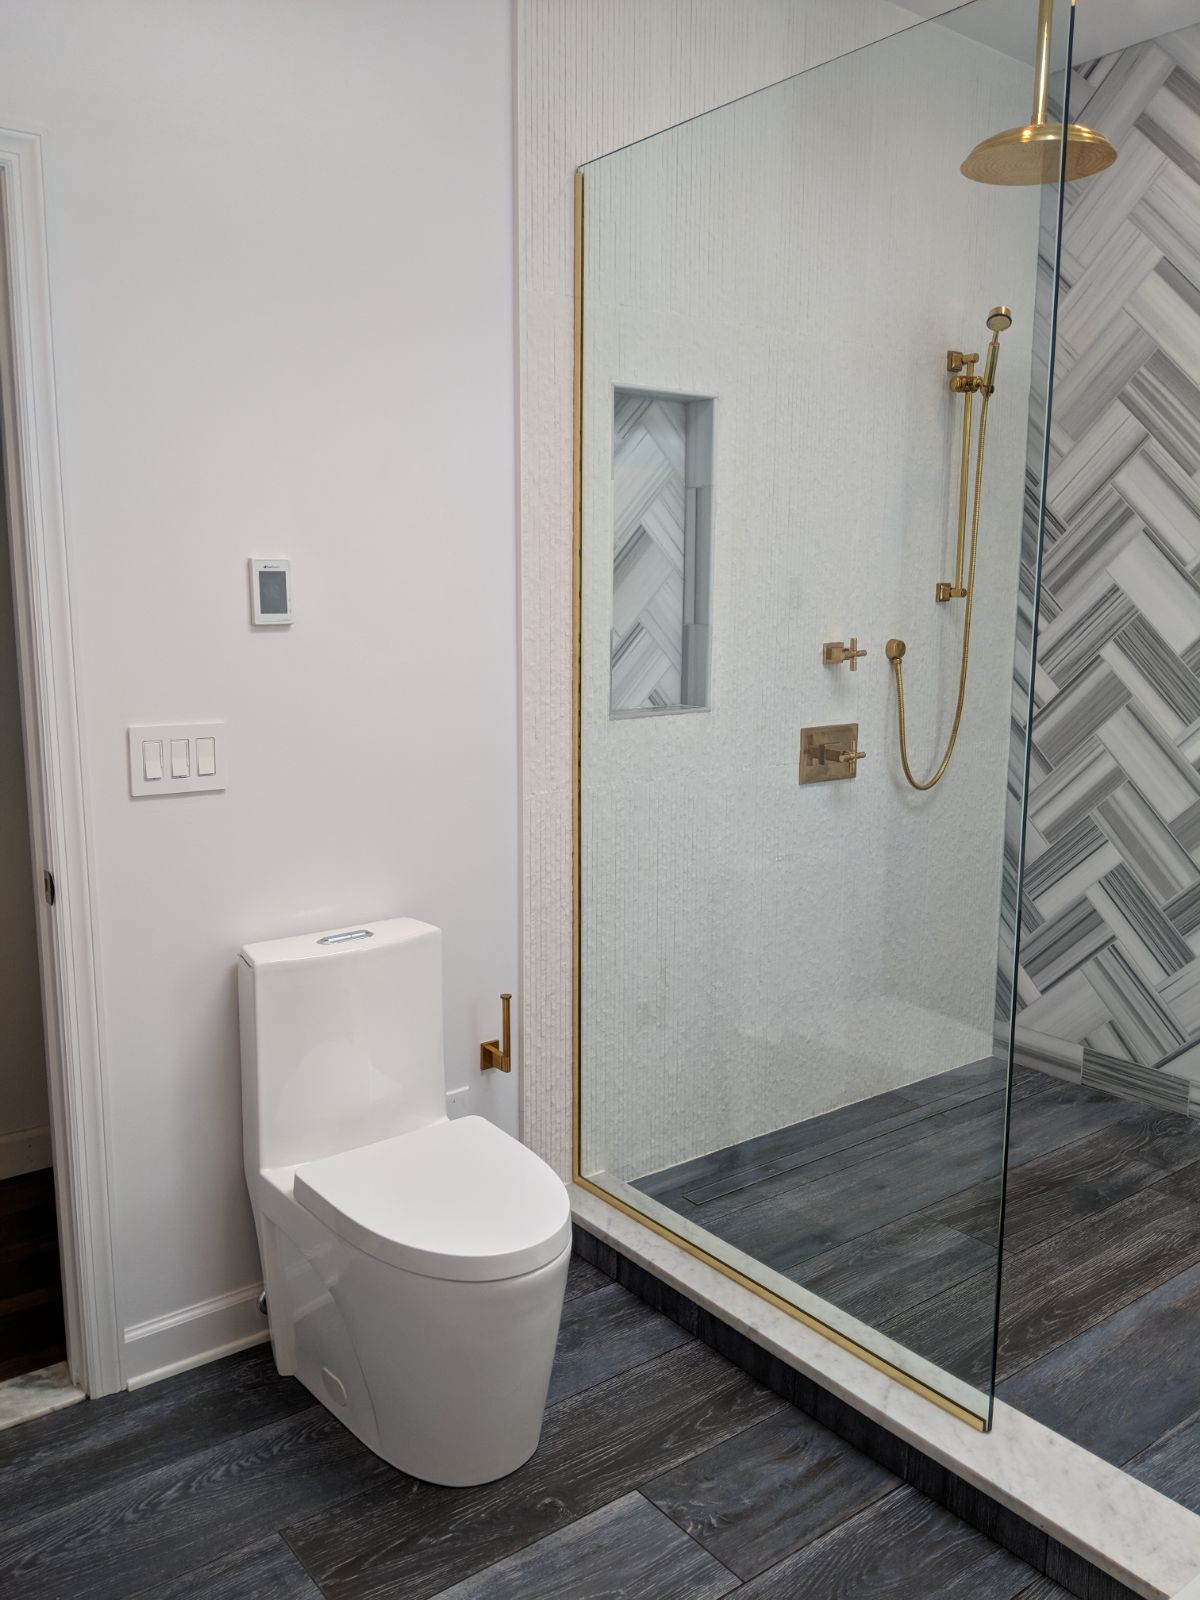 Full Bathroom Renovation in Jersey City, NJ